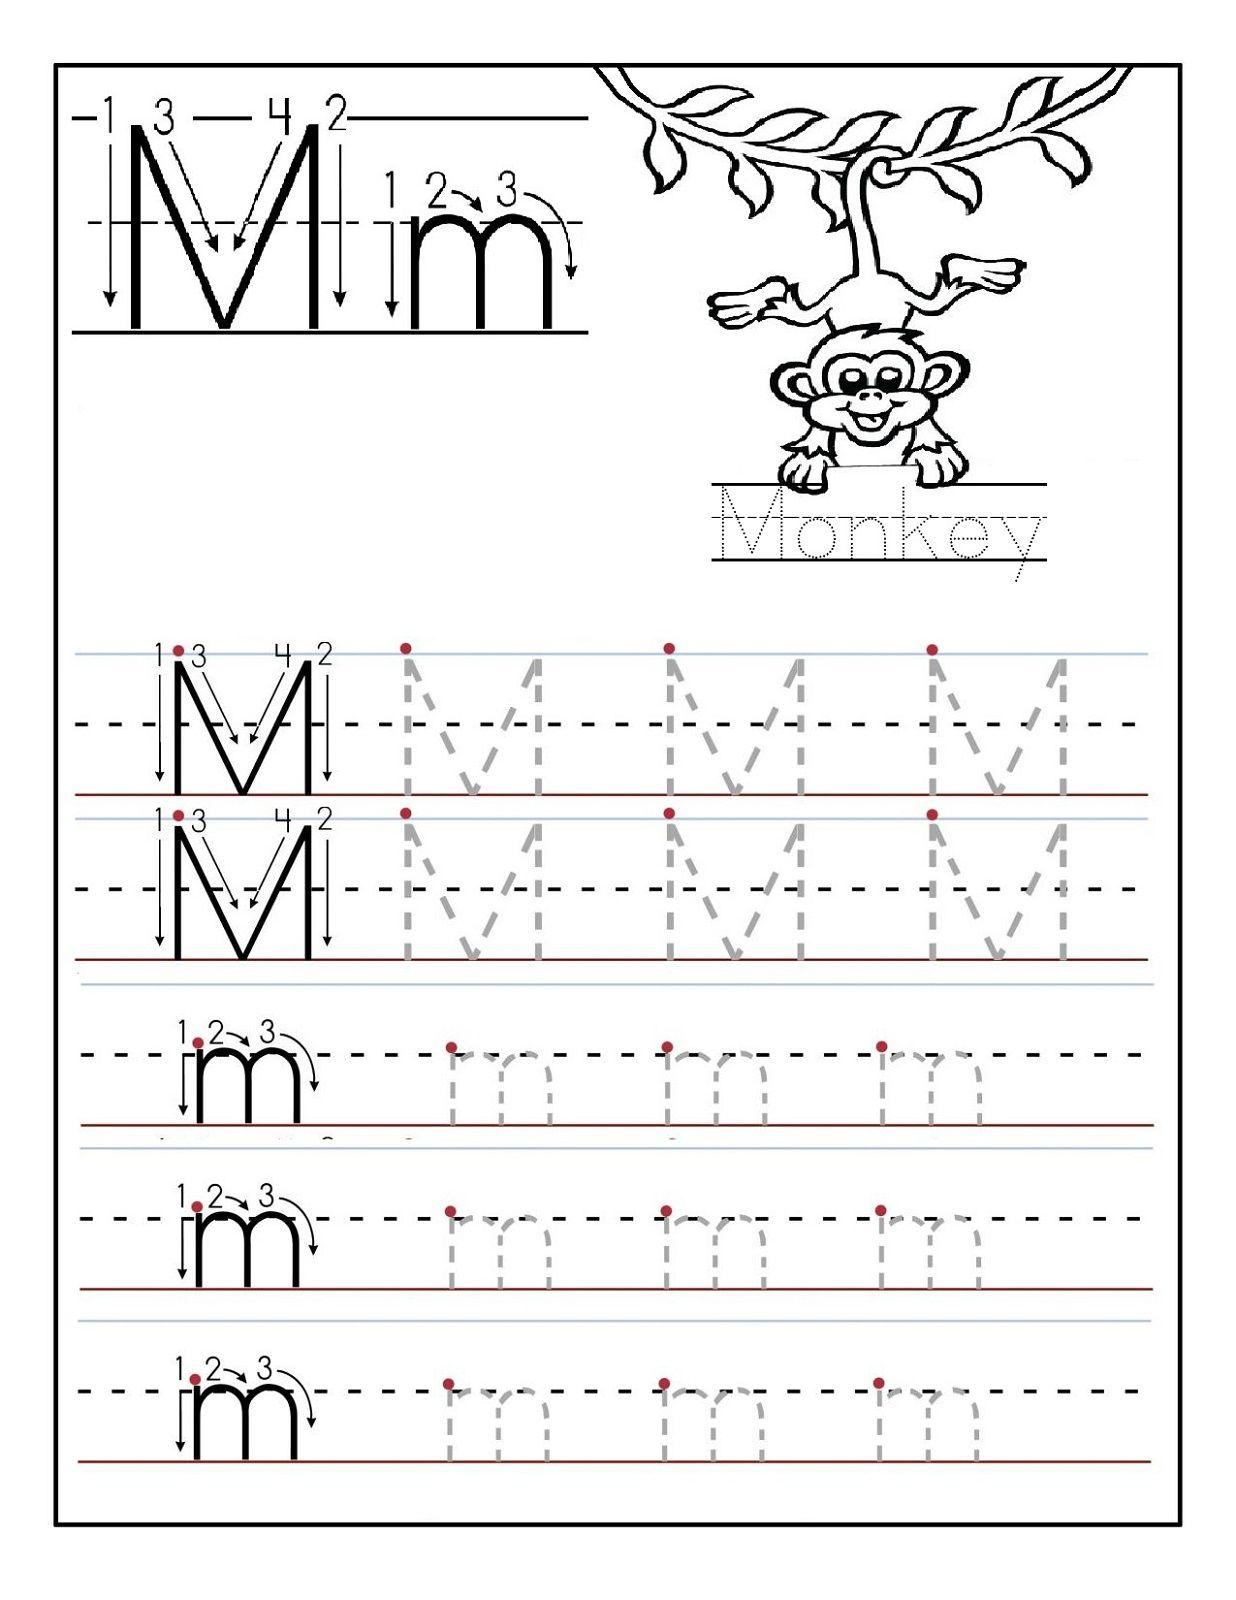 Words Starting With Letter M Letter M Worksheets Lettering Preschool Letters